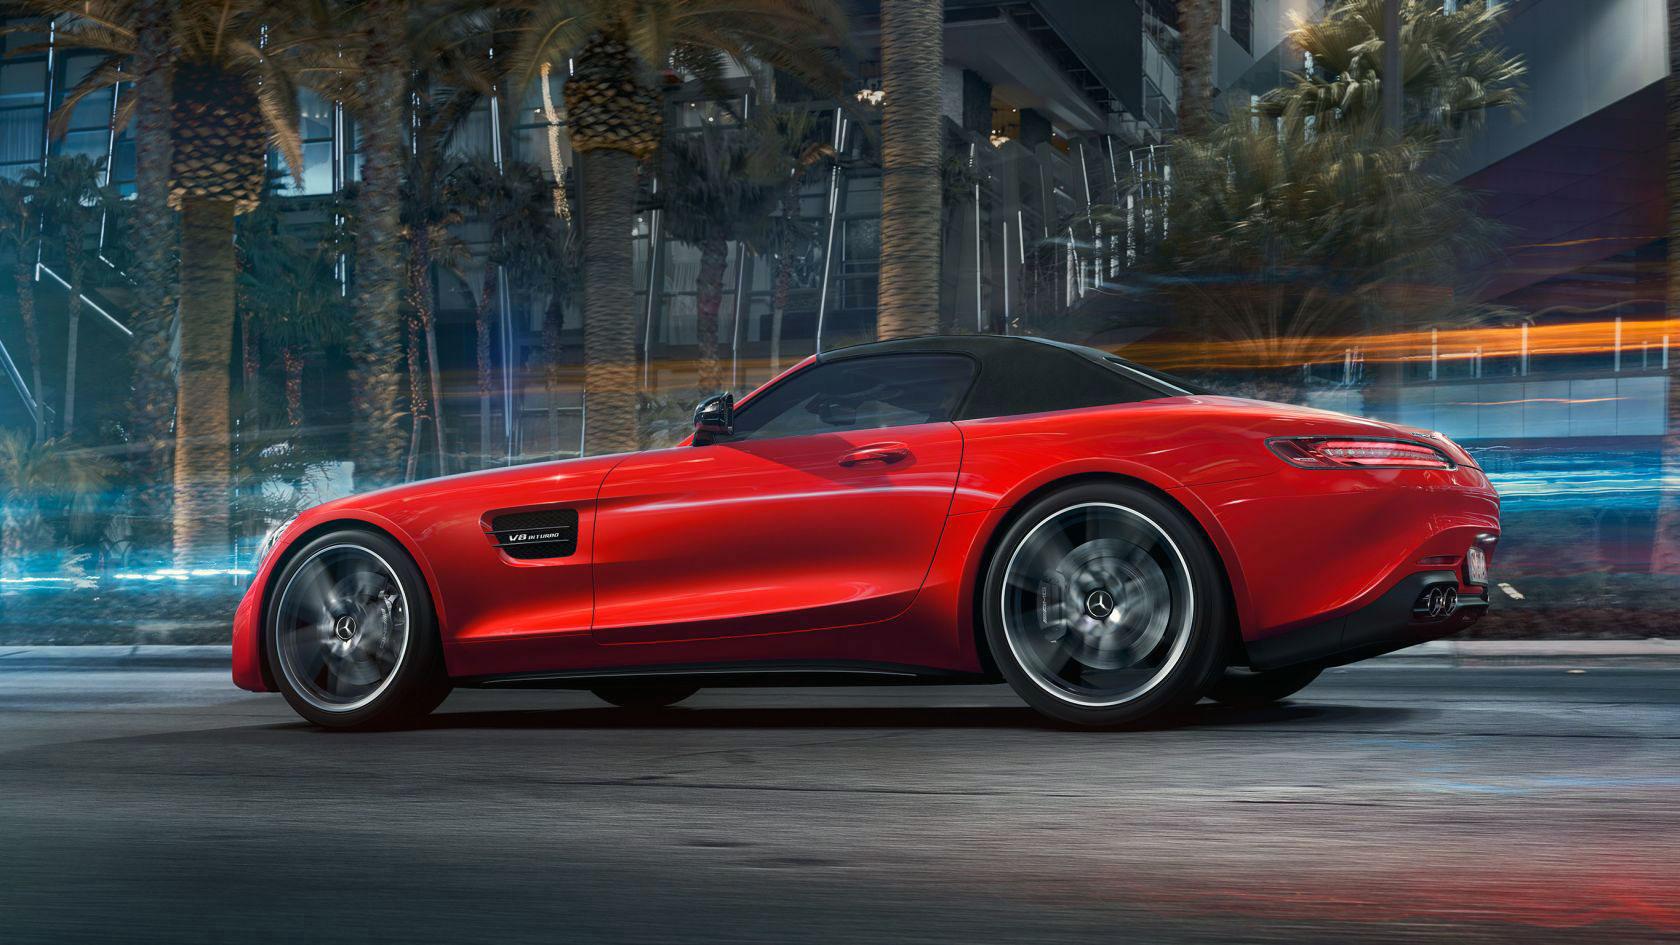 Mercedes-AMG GT Roadster Exterior 04